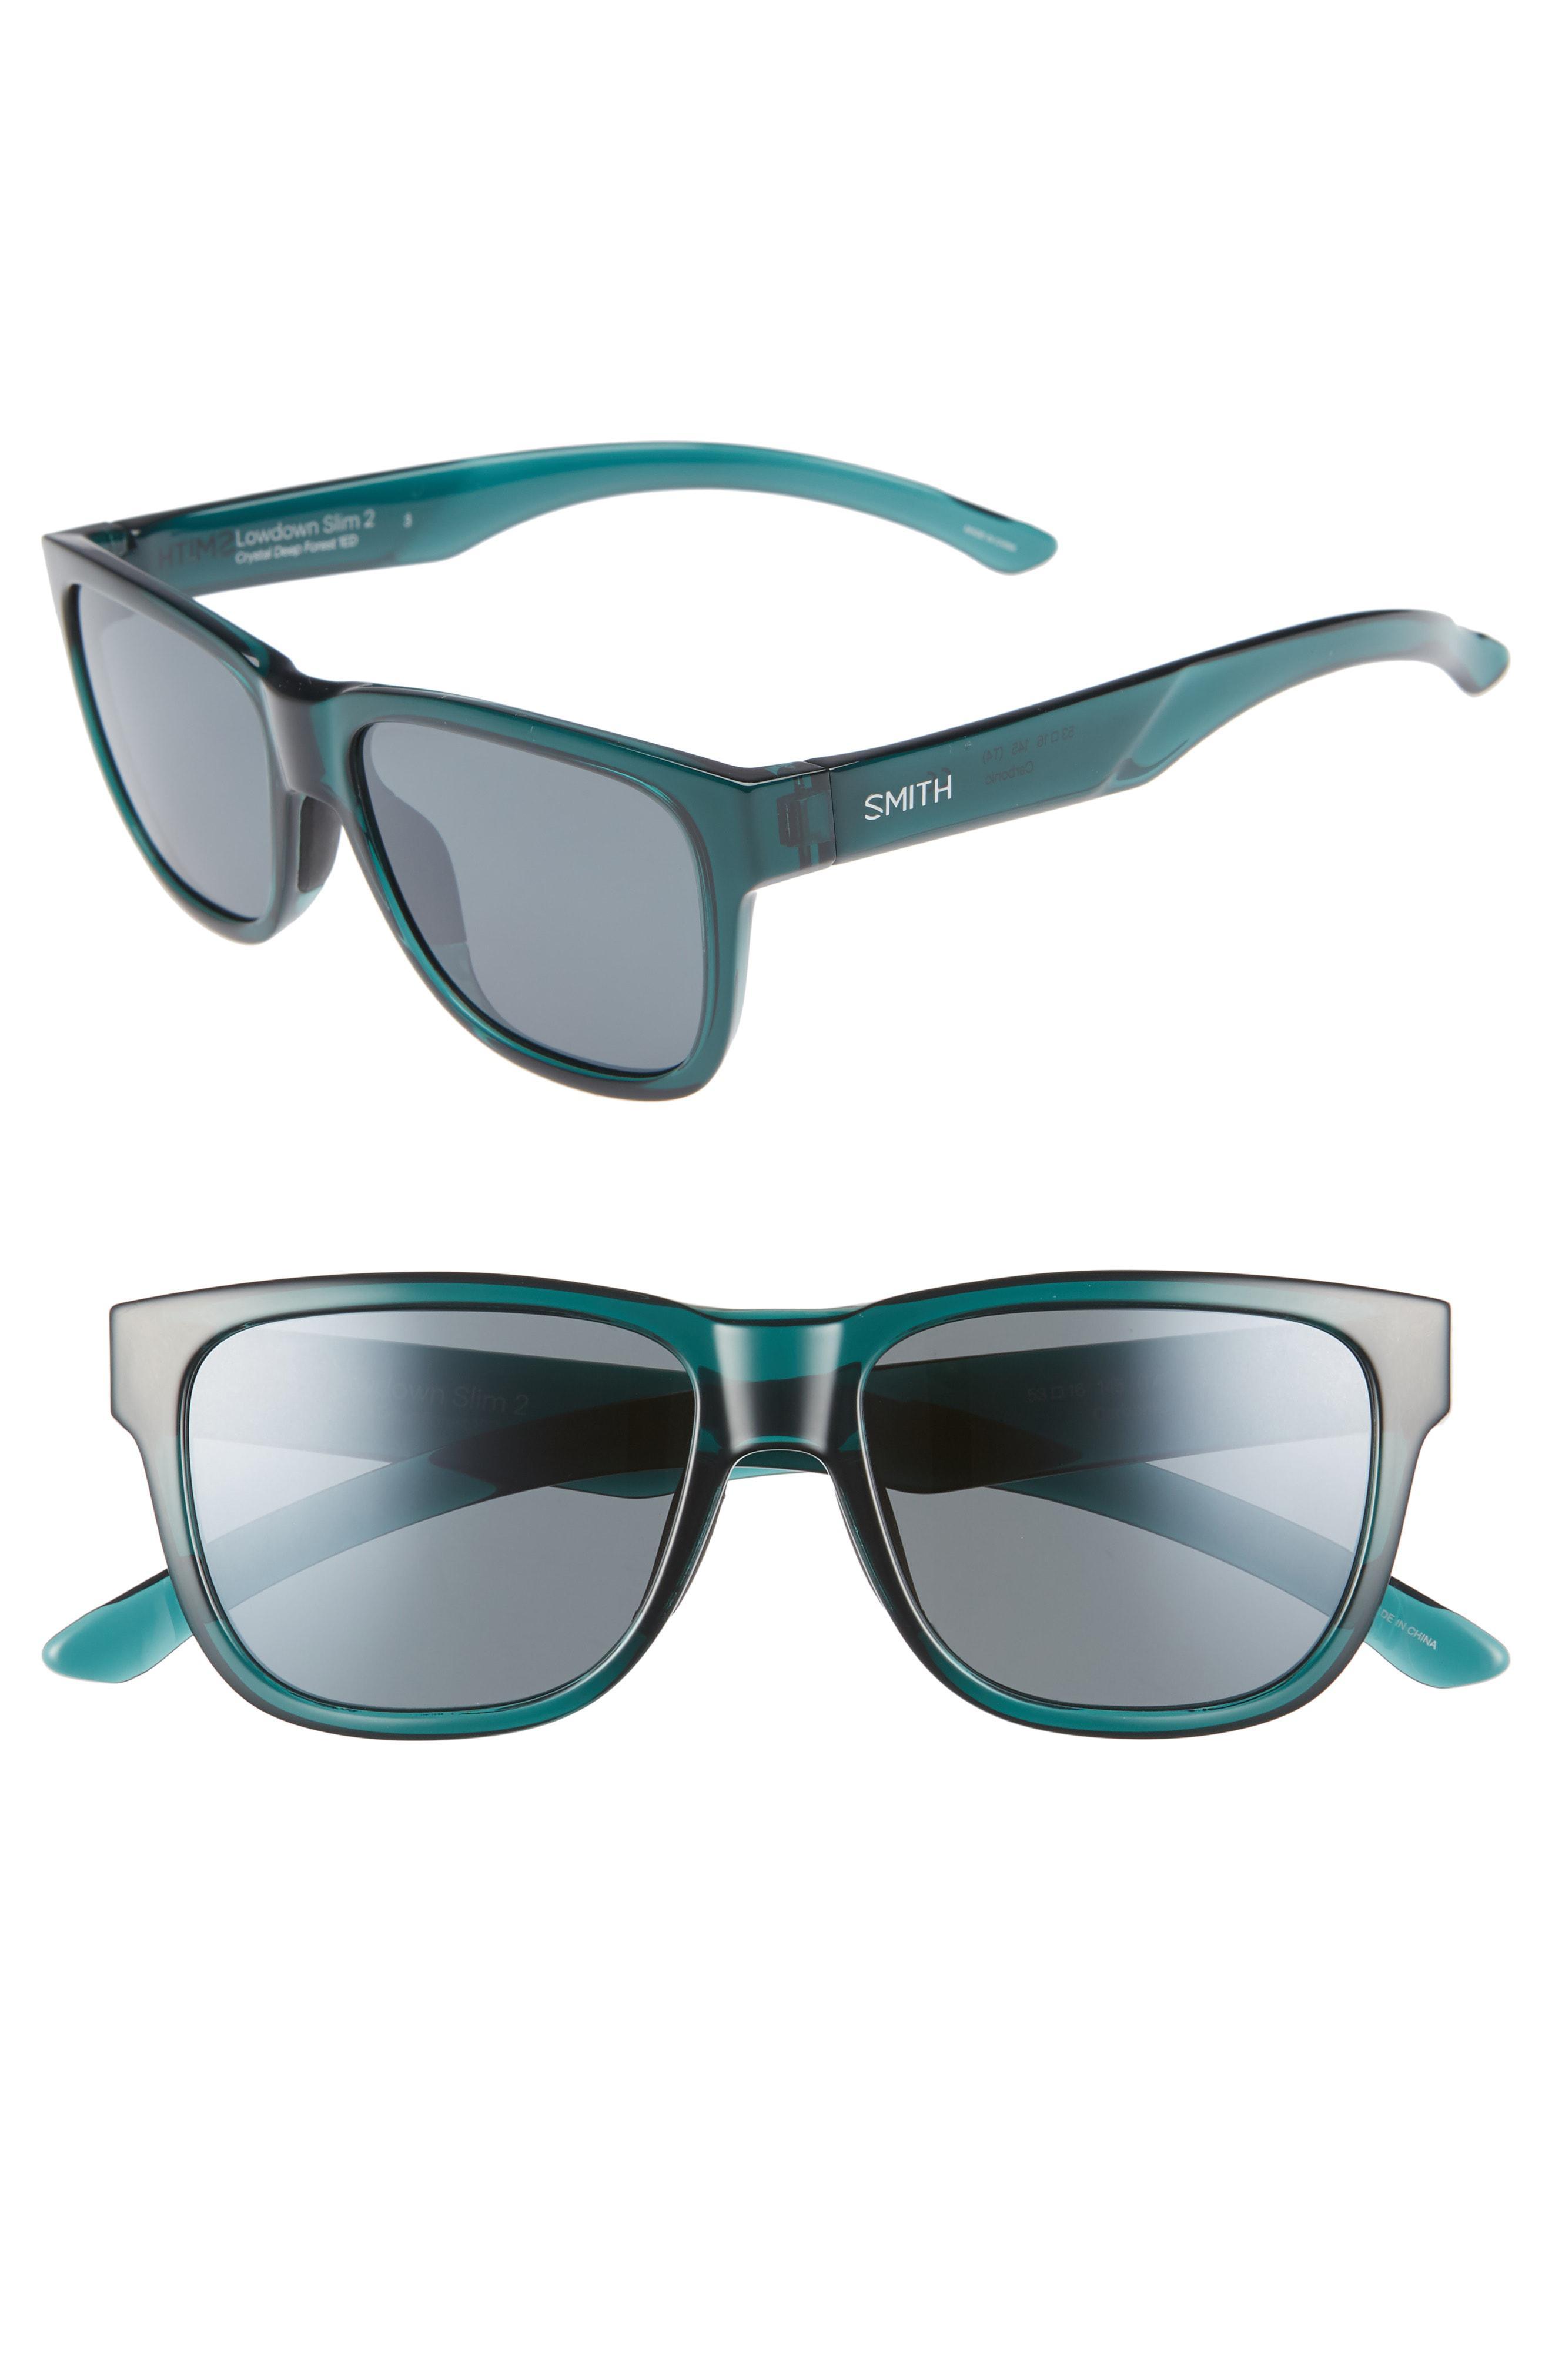 a2682b36fe Smith - Blue Lowdown Slim 2 53mm Chromapop(tm) Polarized Square Sunglasses  - -. View fullscreen